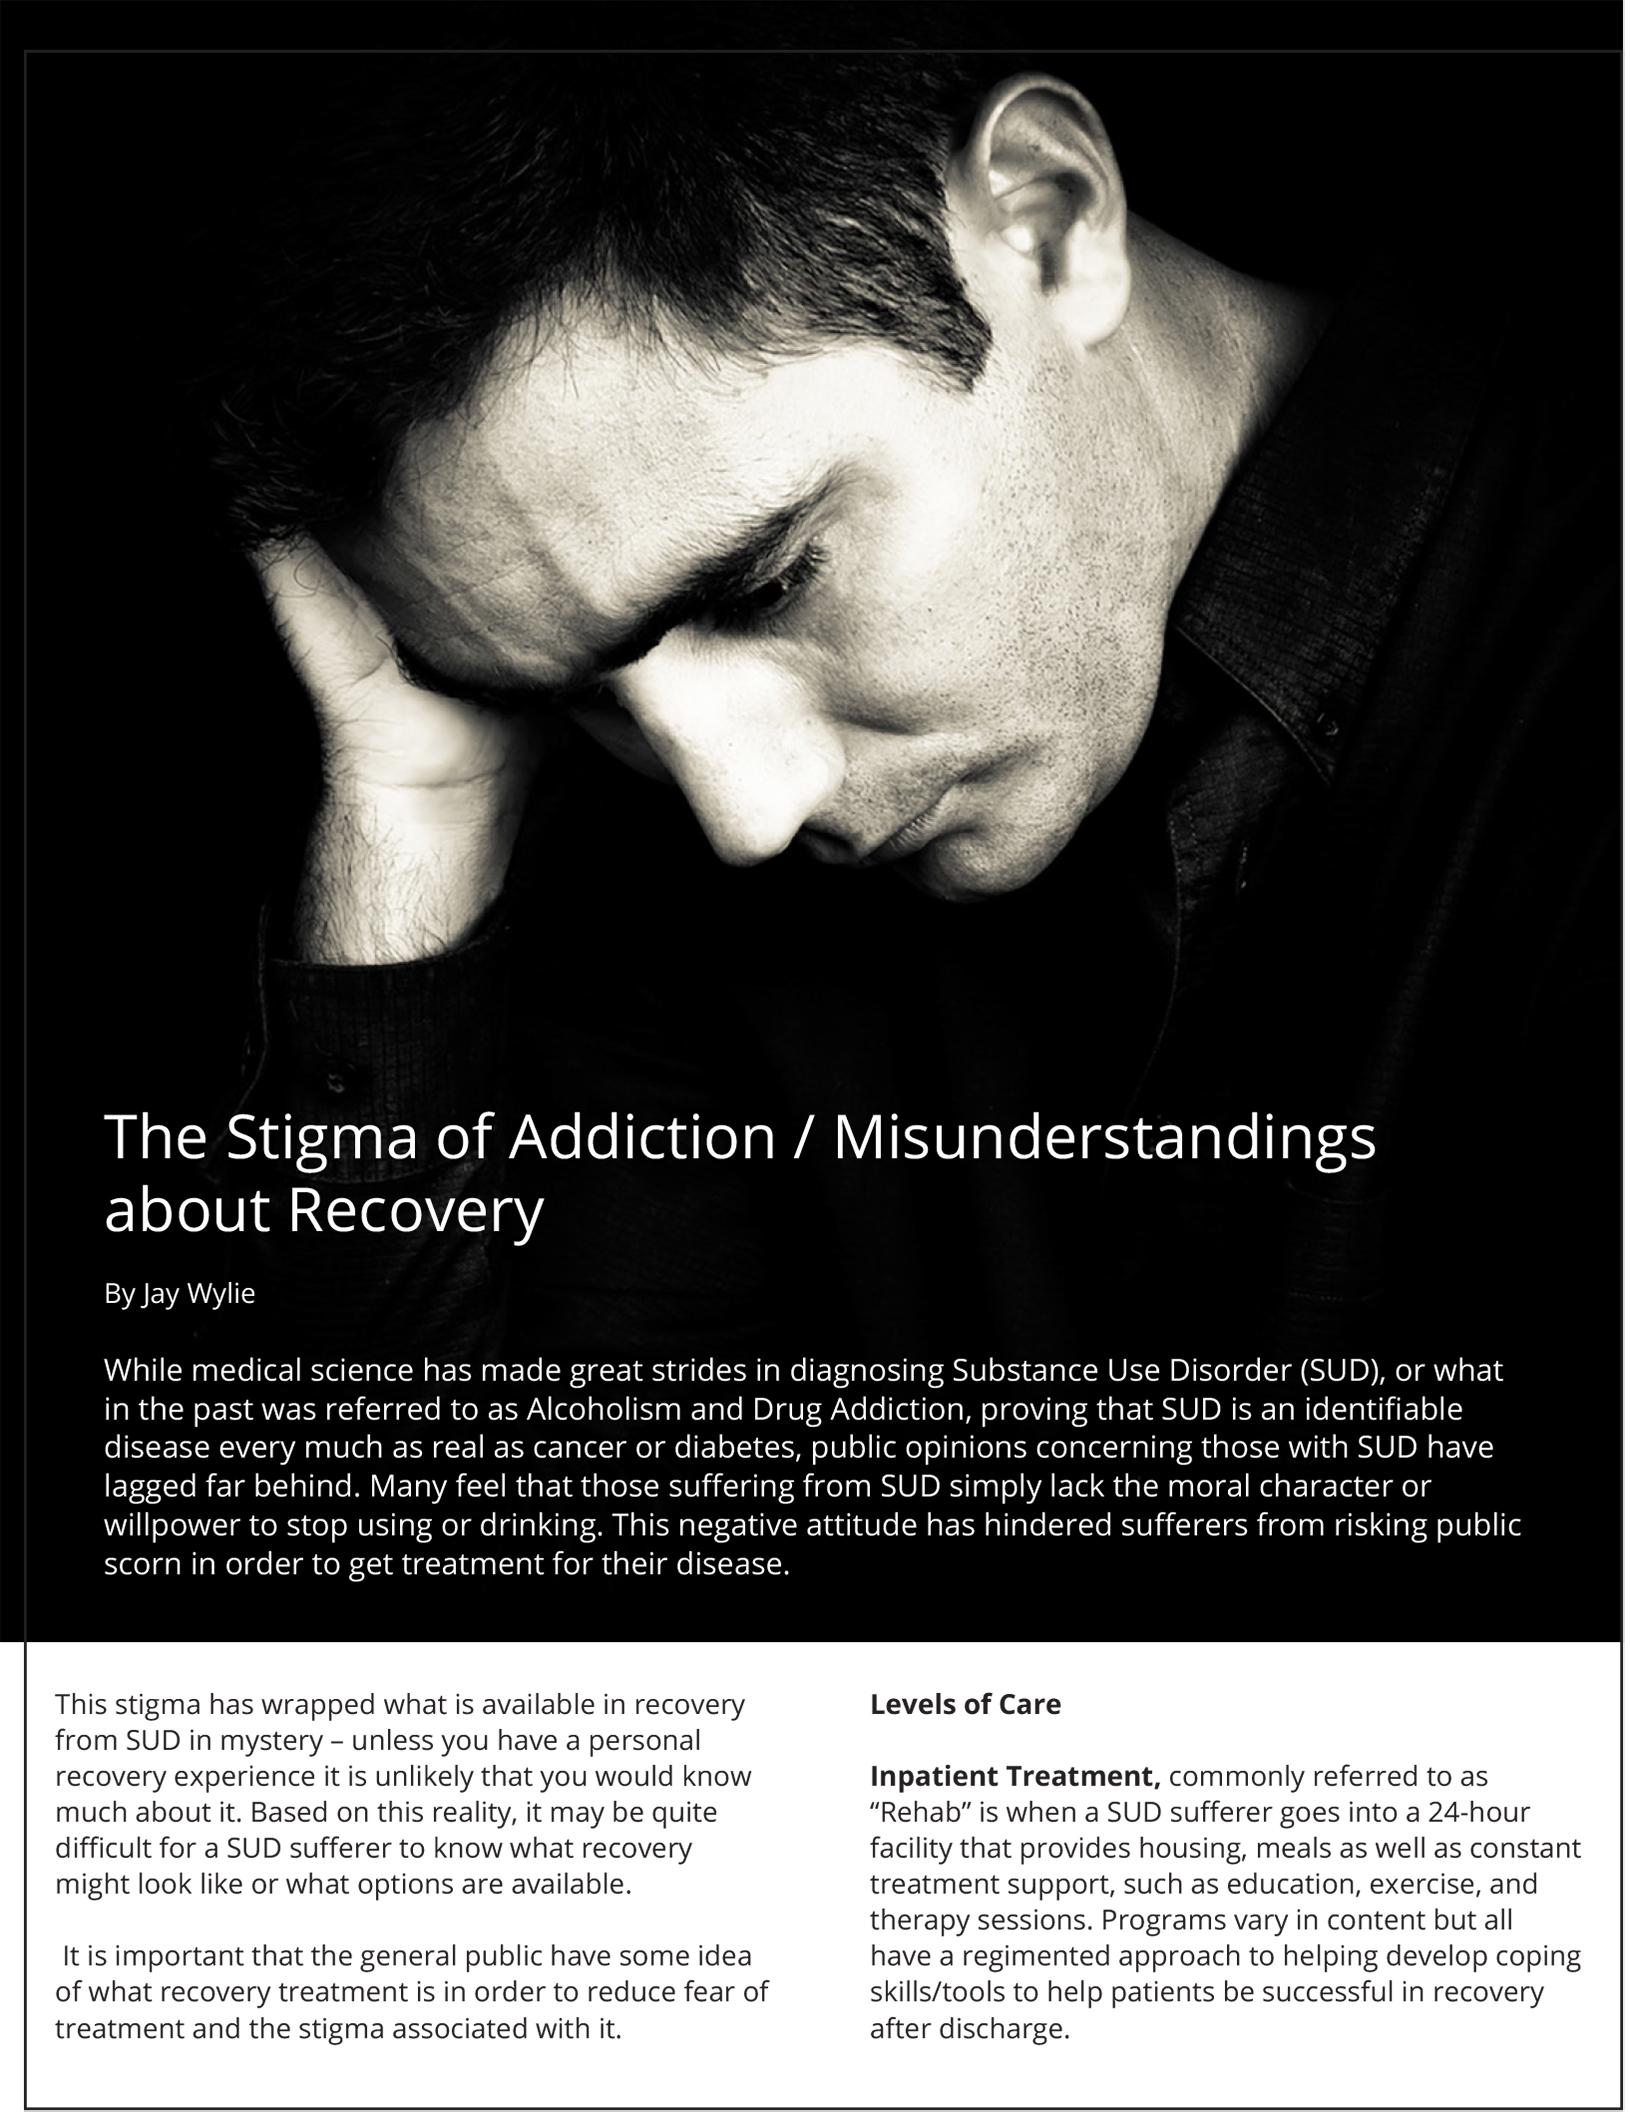 https://sandiegoveteransmagazine.com/wp-content/uploads/2021/01/recovery-1.jpg